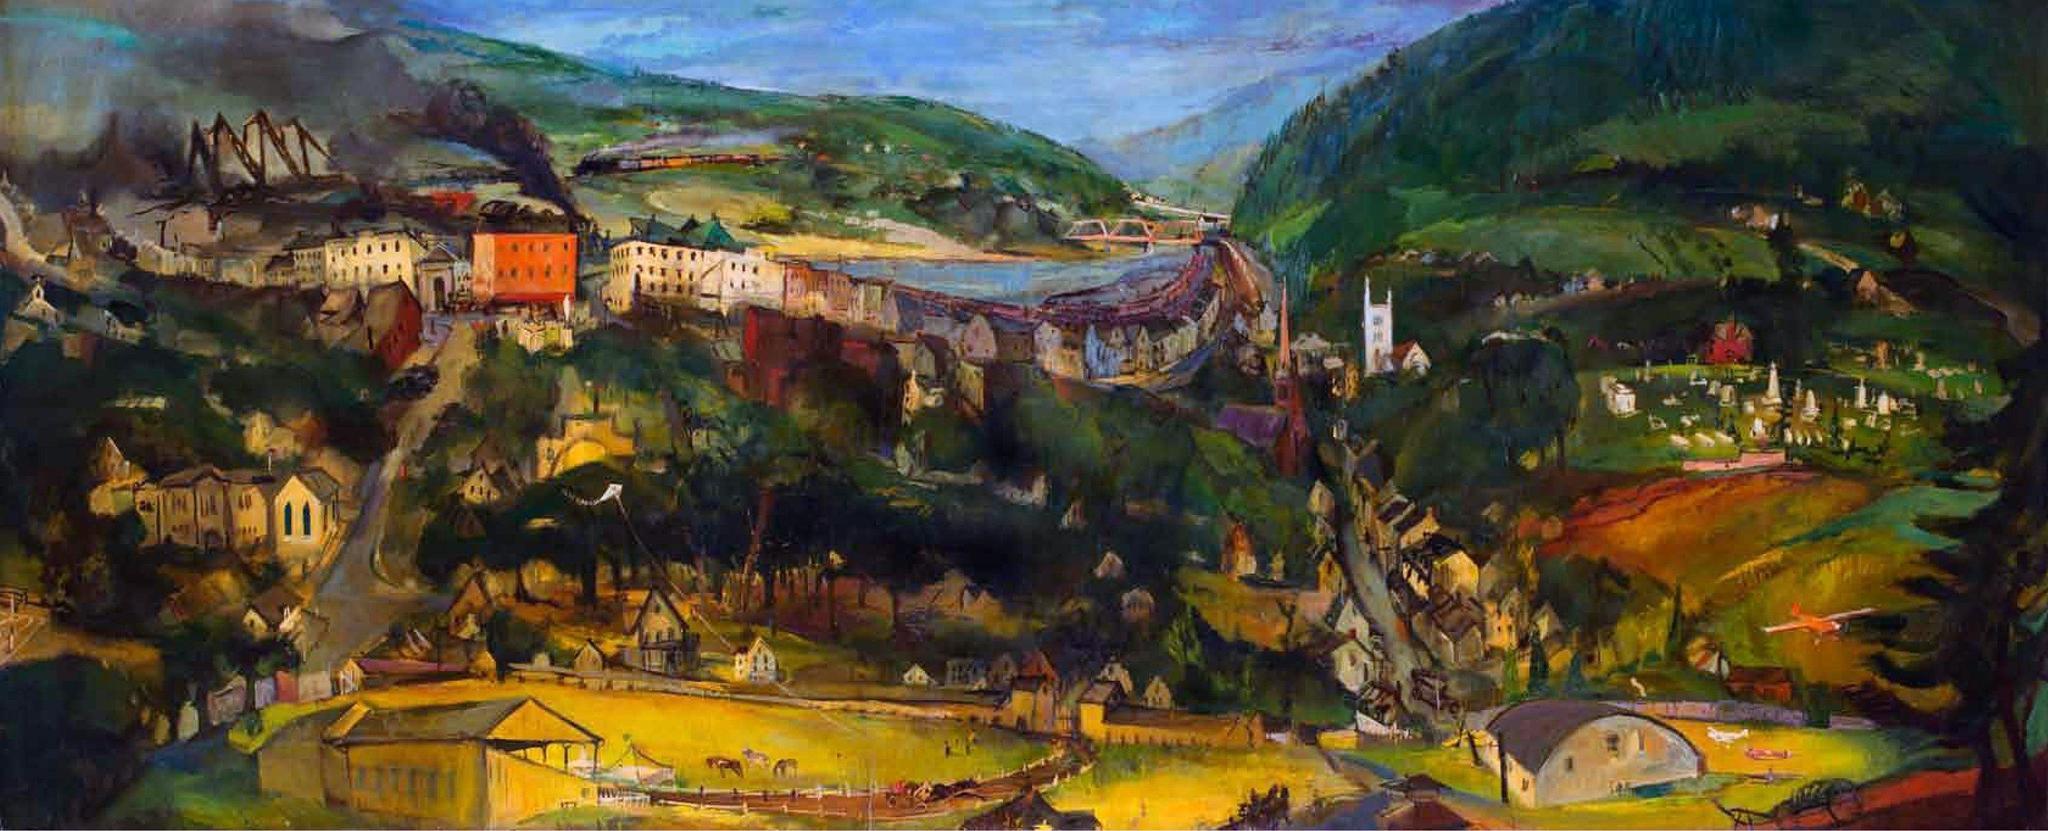 Franz Kline View of Lehighton